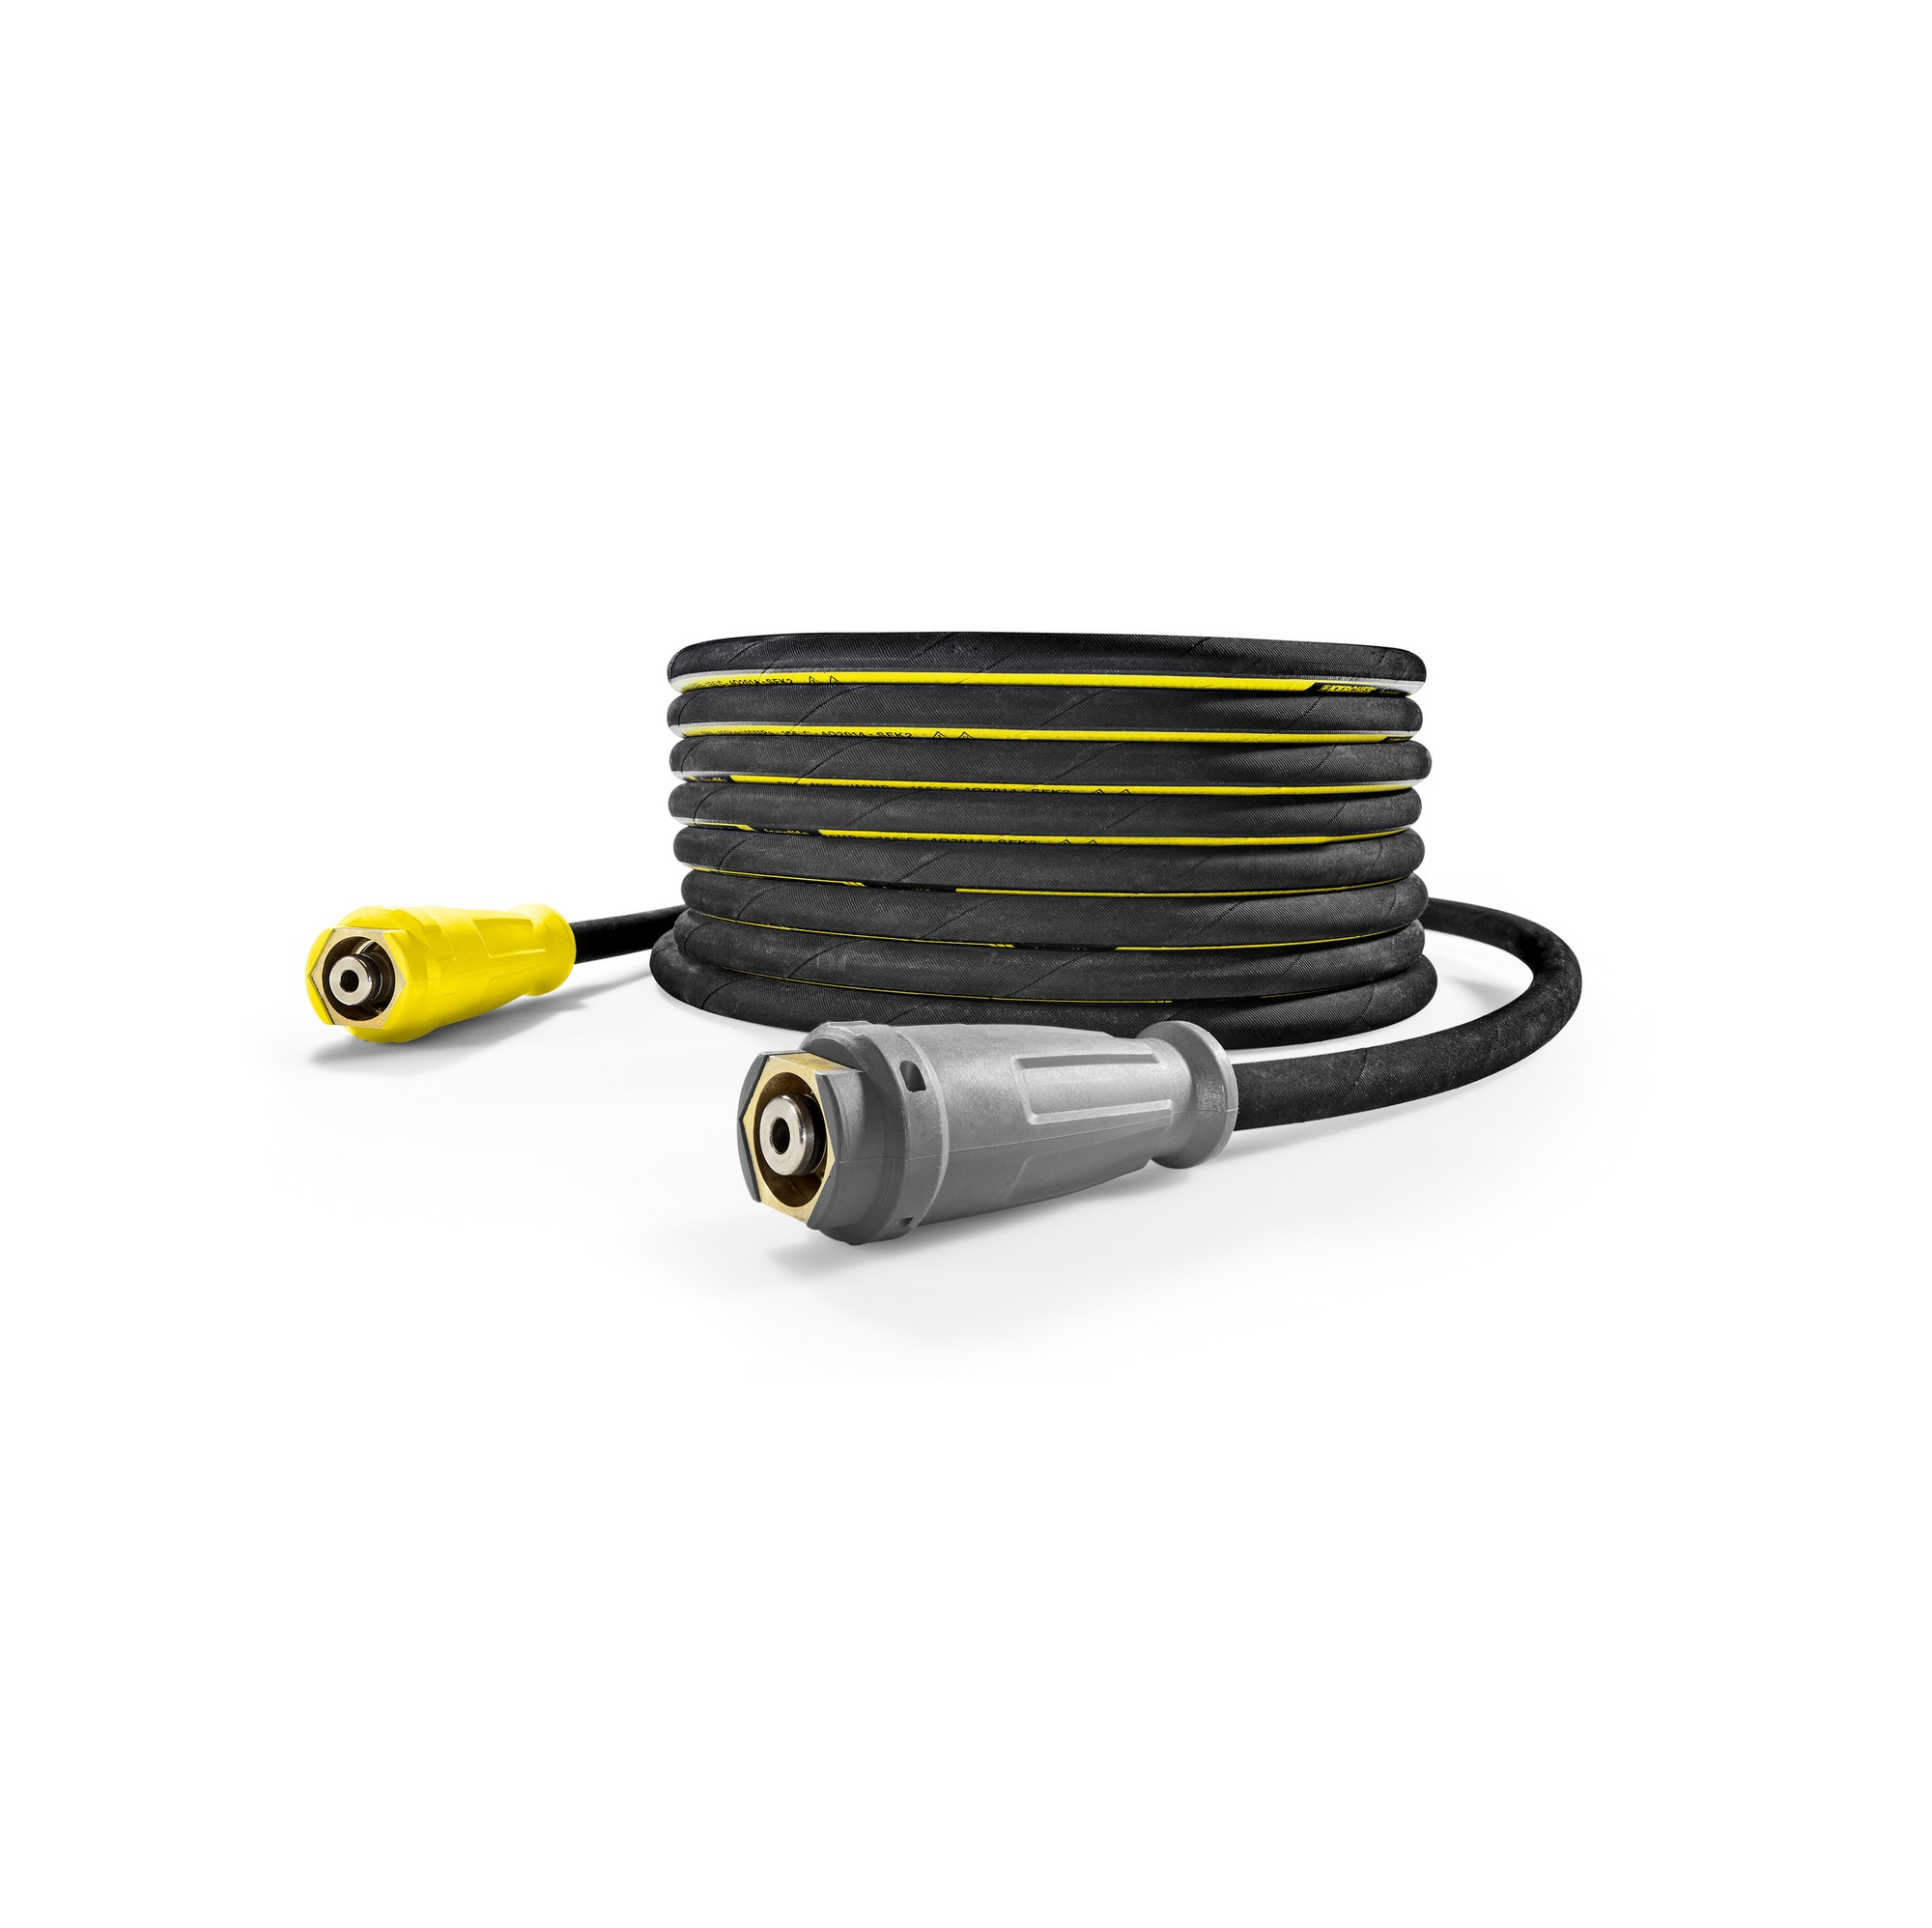 Маркуч високо налягане Karcher HD-маркуч DN 8, 20 m, 315 bar